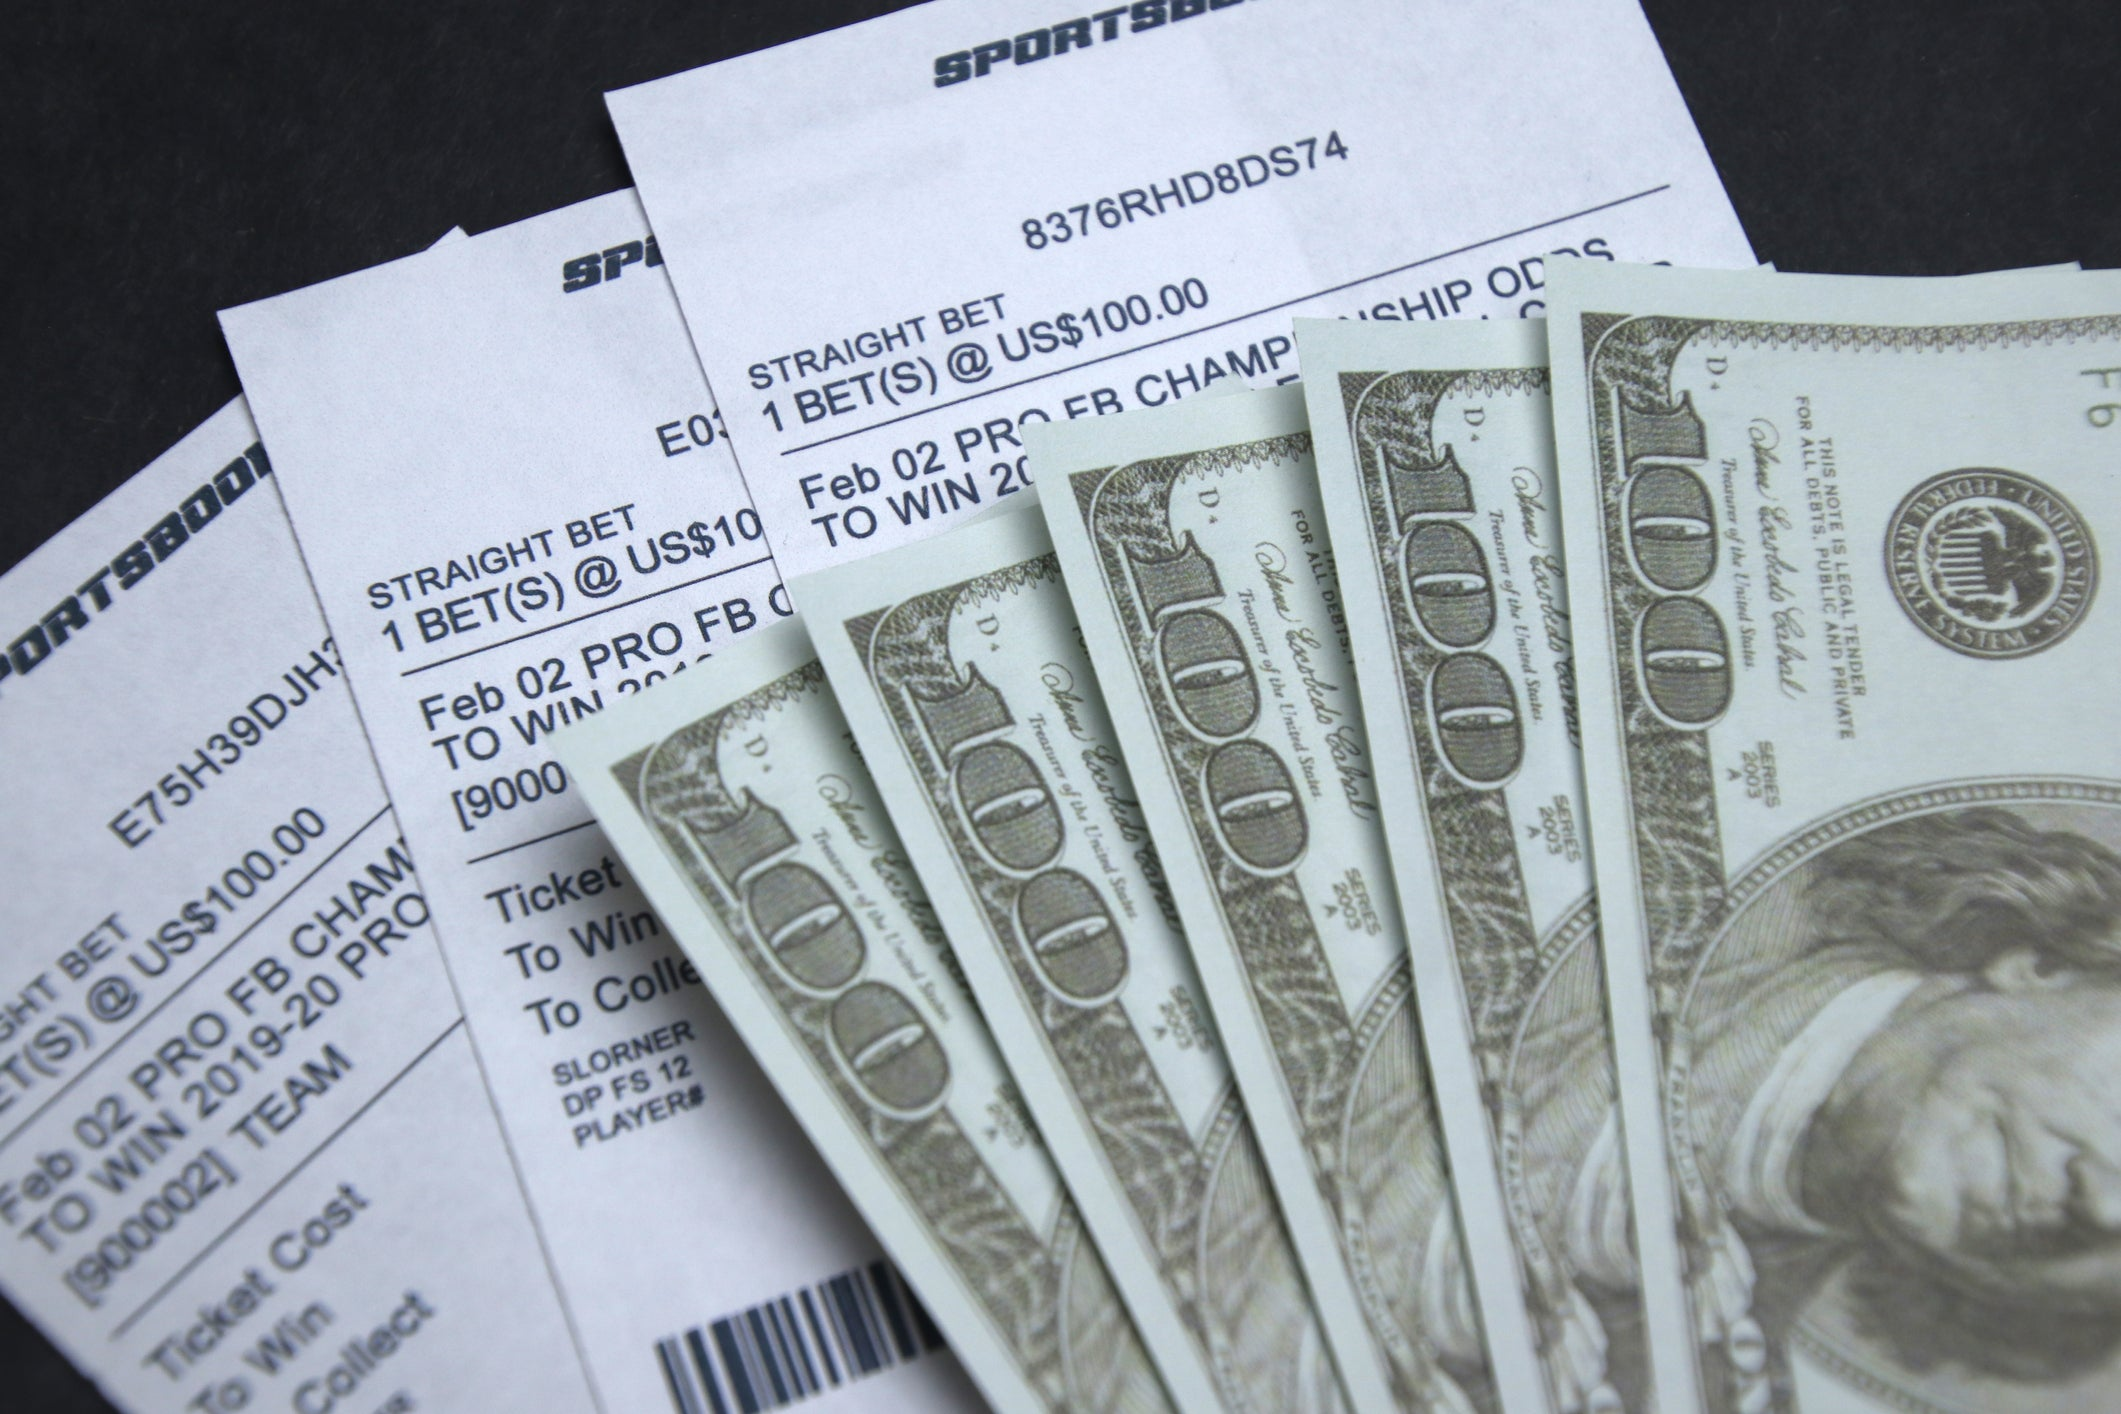 Finance watch paper investing not betting csgo betting 0 0123456789